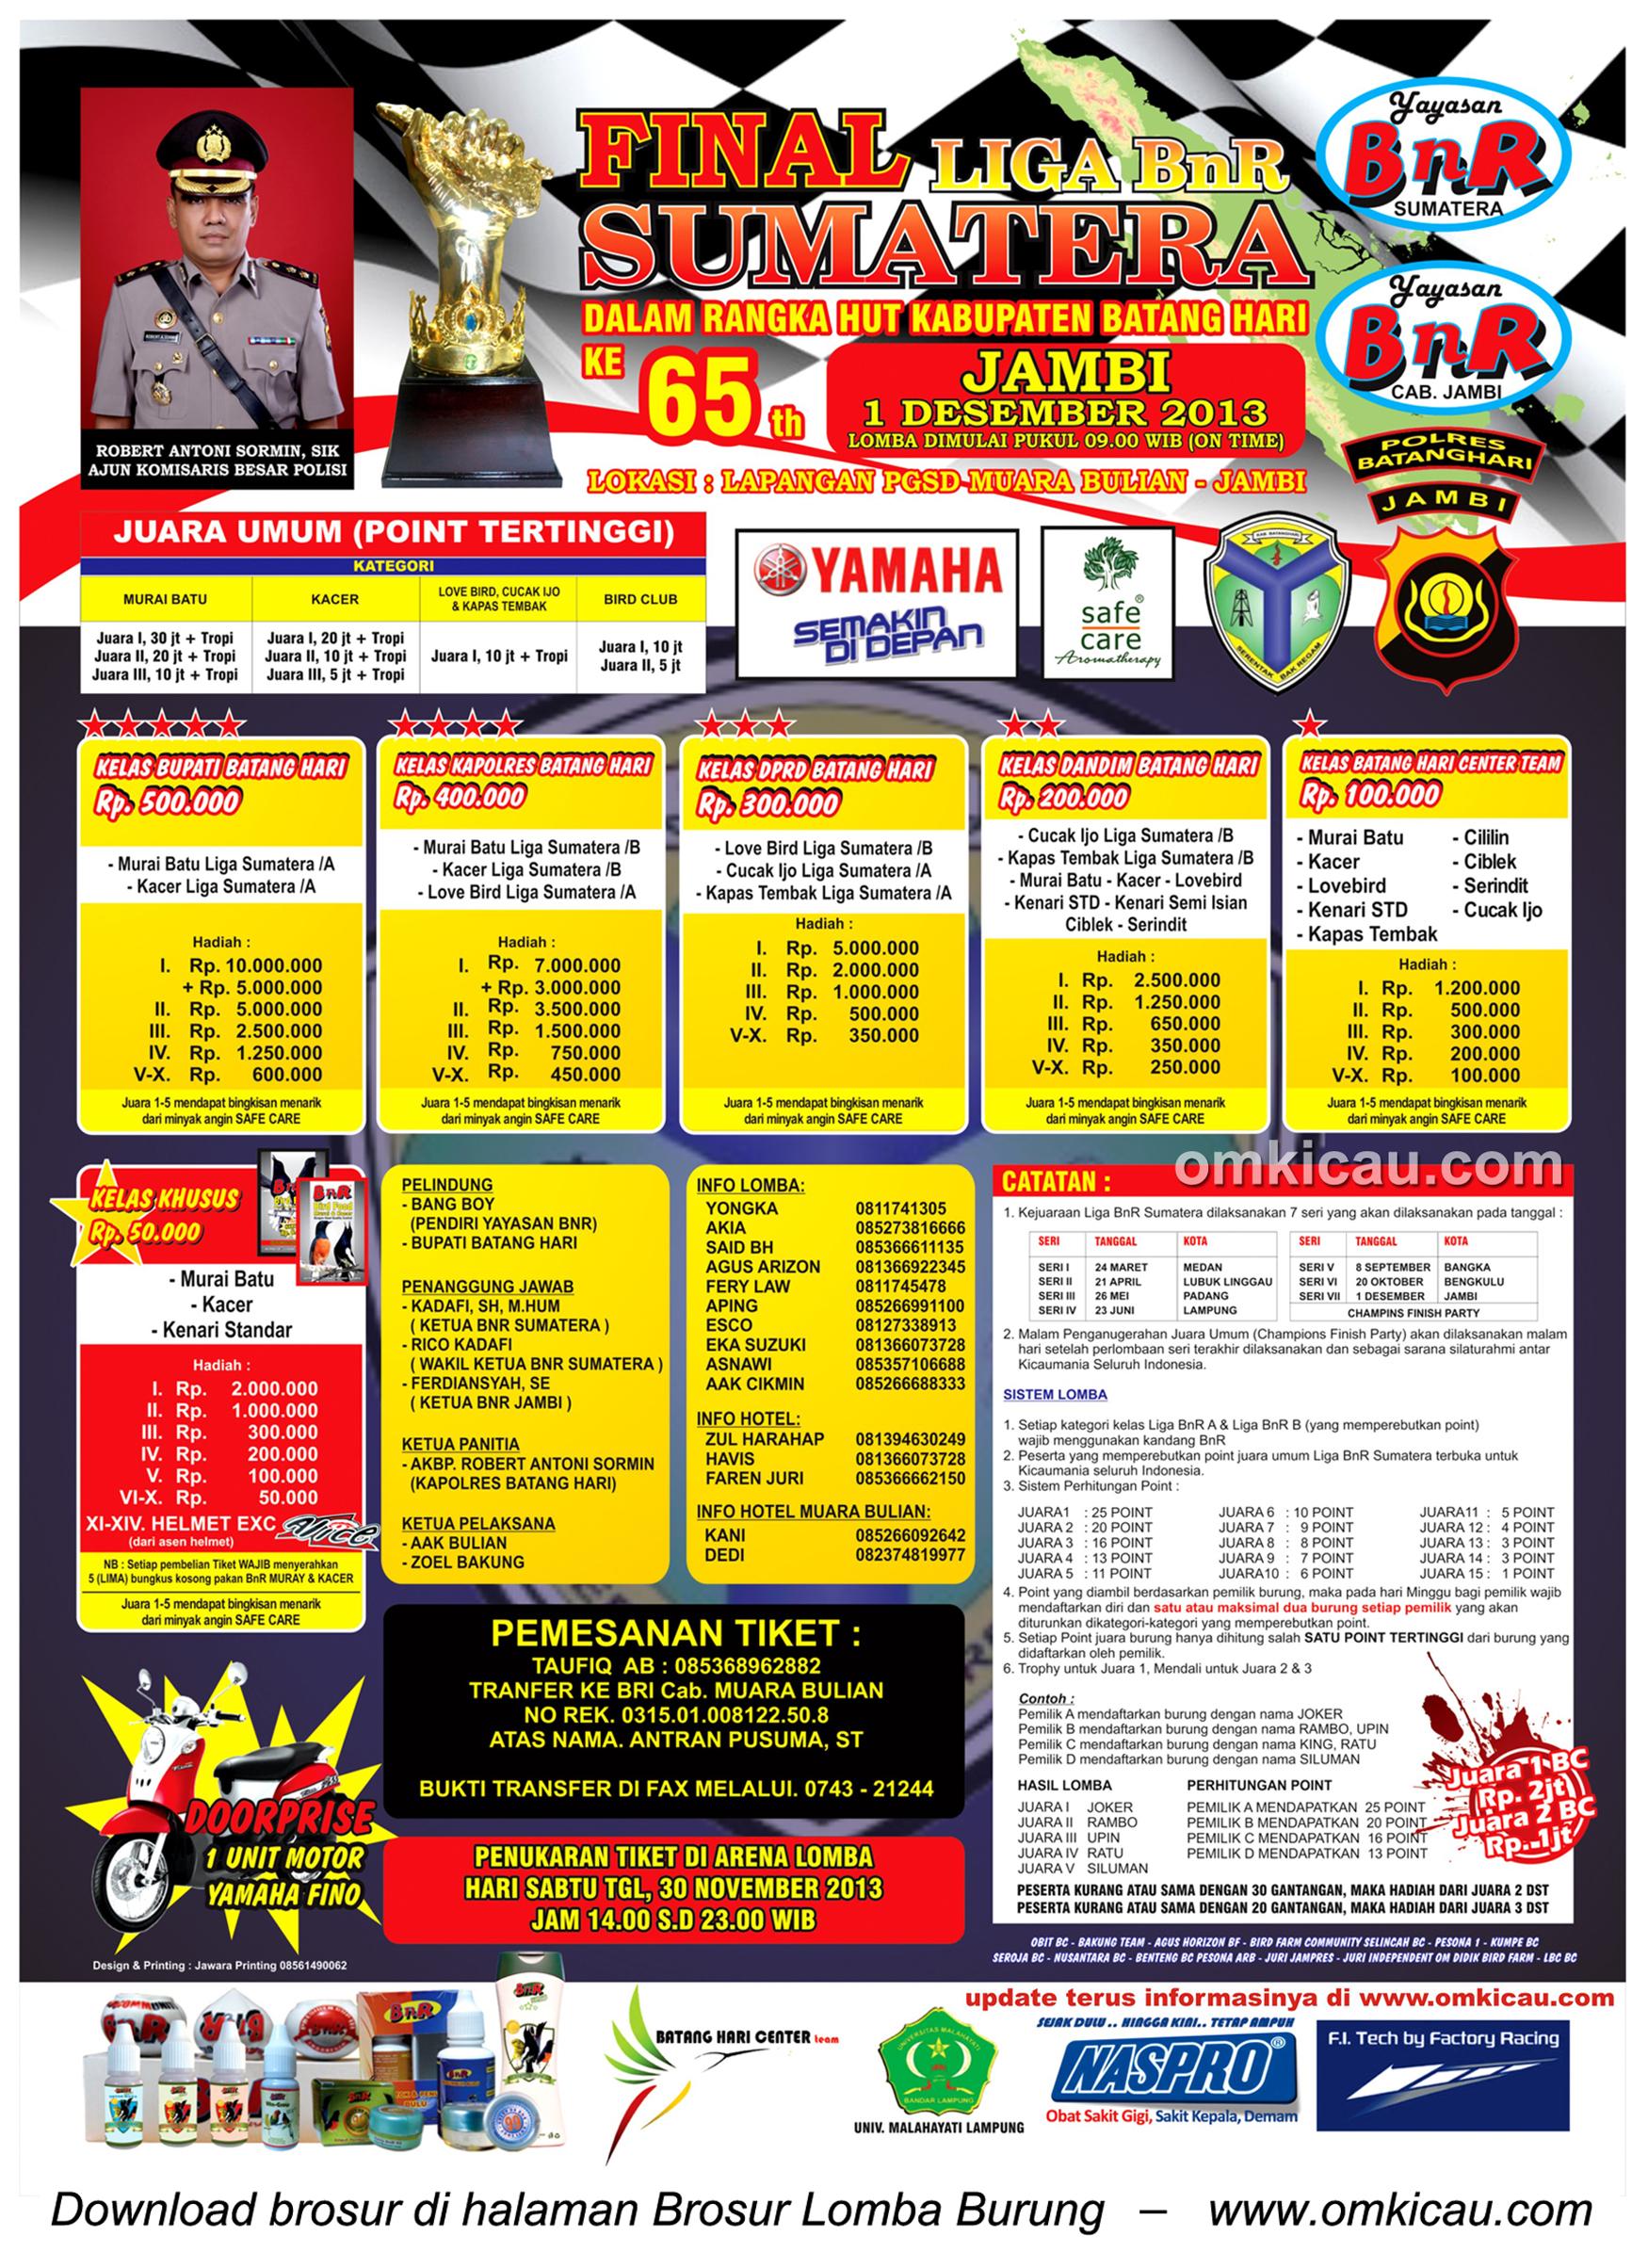 Brosur Lomba Burung Berkicau Final Liga Sumatera, Muara Bulian, 1 Desember 2013